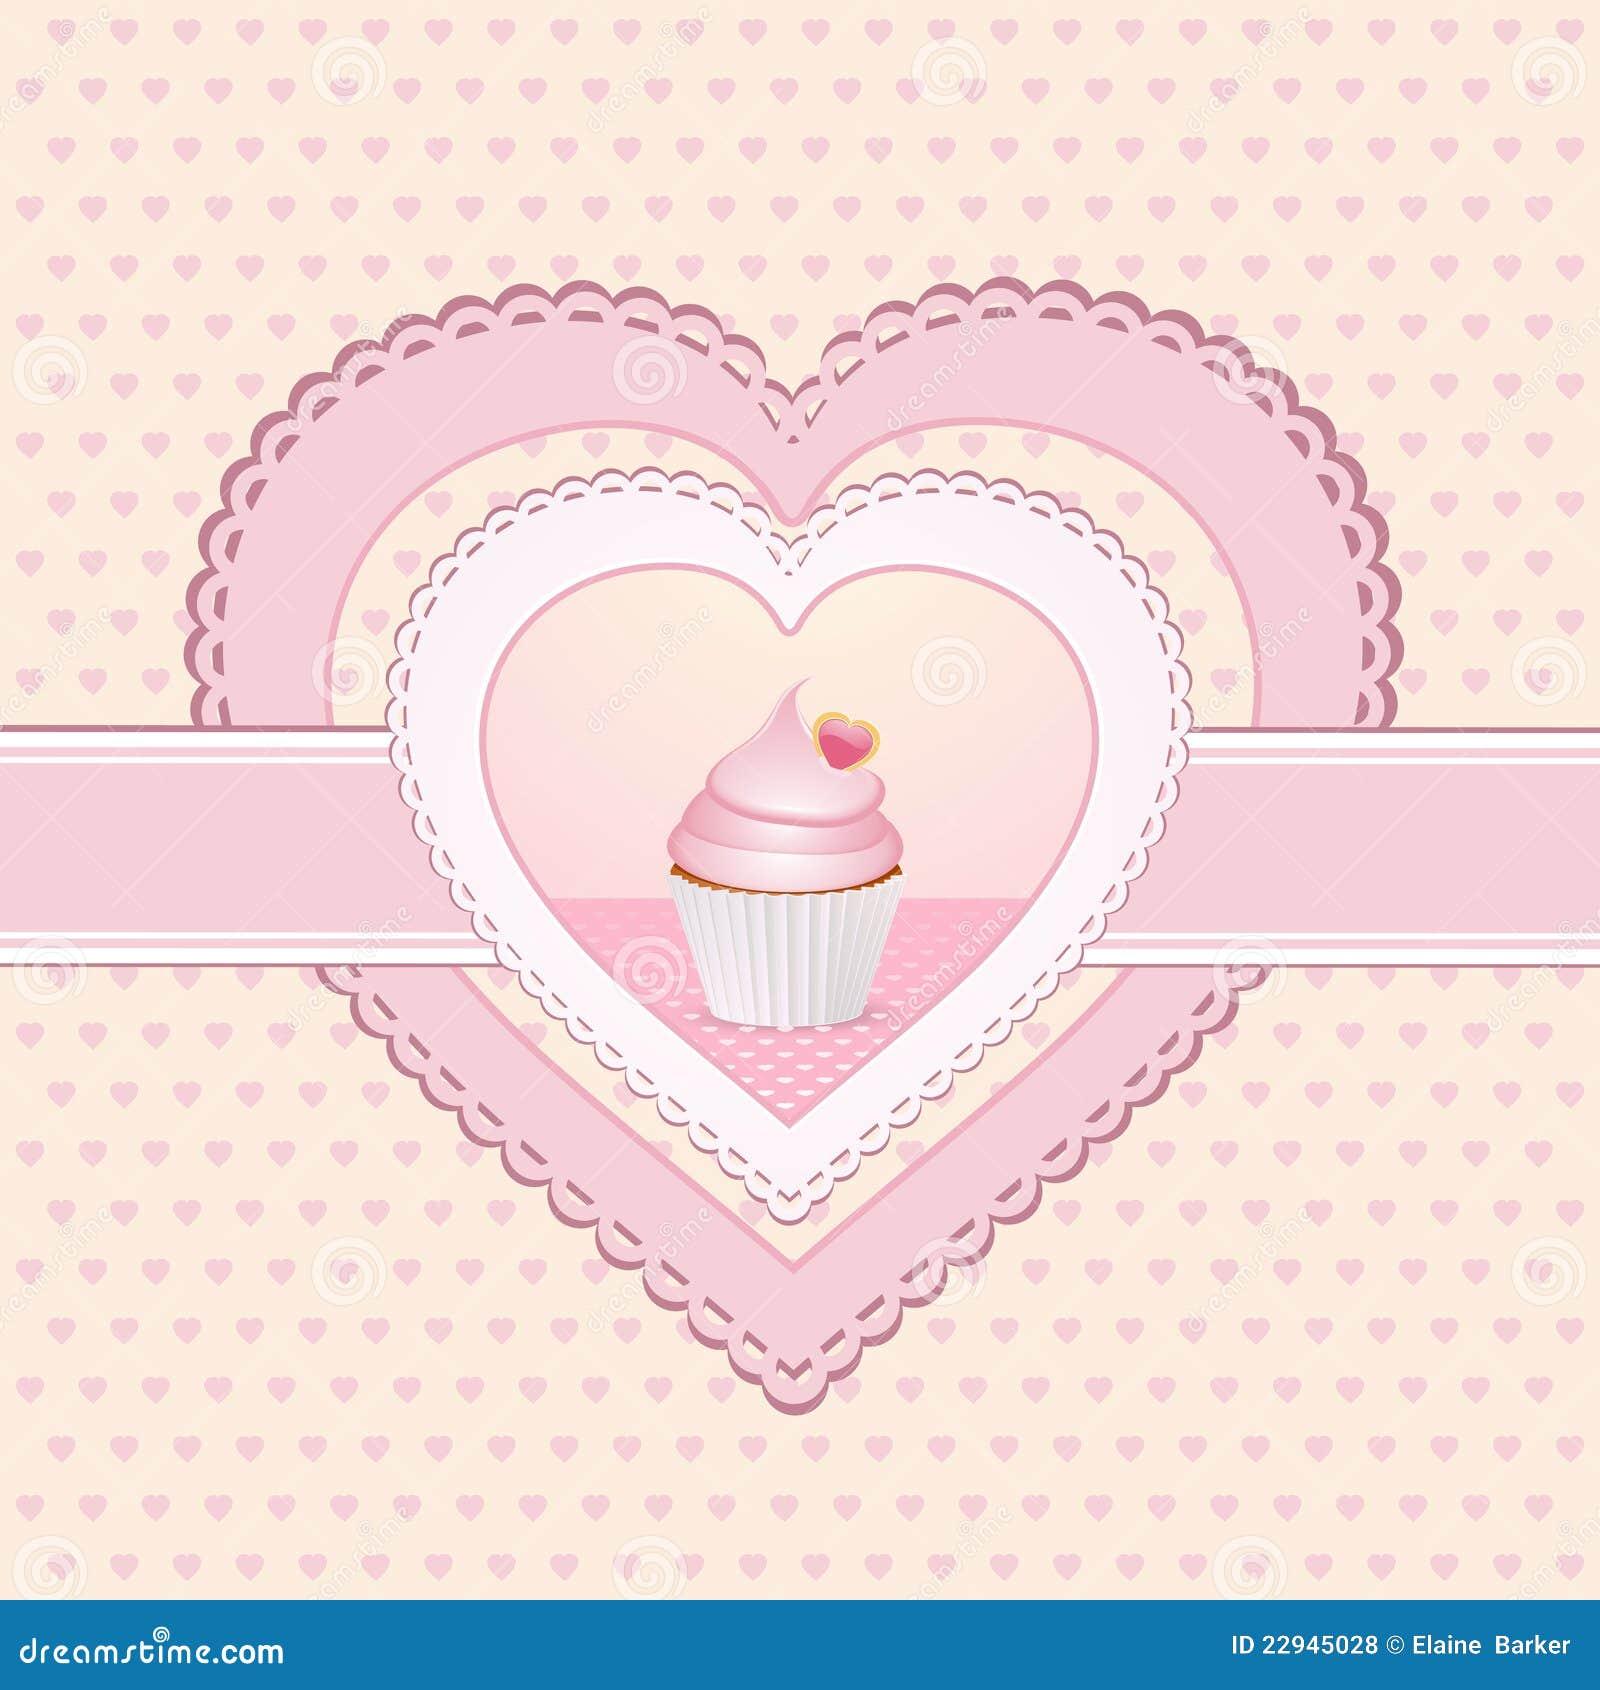 Cupcake Heart Label Royalty Free Stock Photos - Image: 22945028